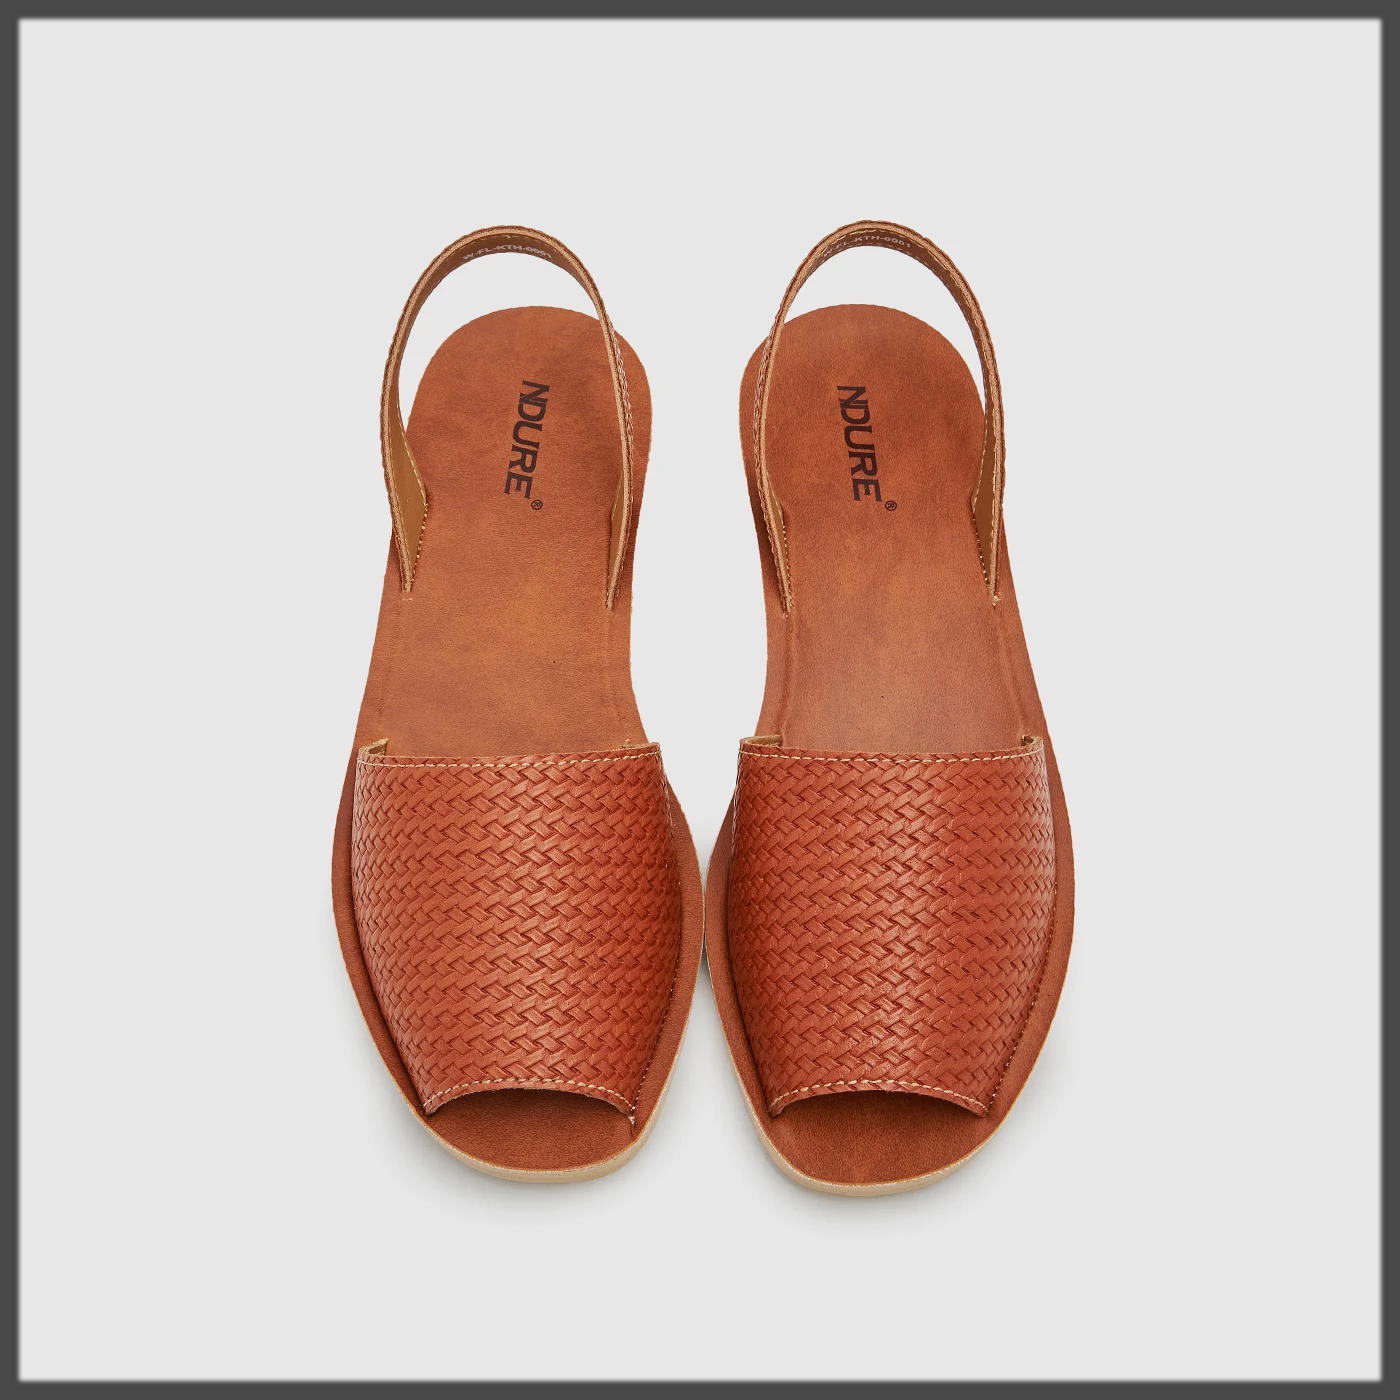 Uber Stylish Women Sandals